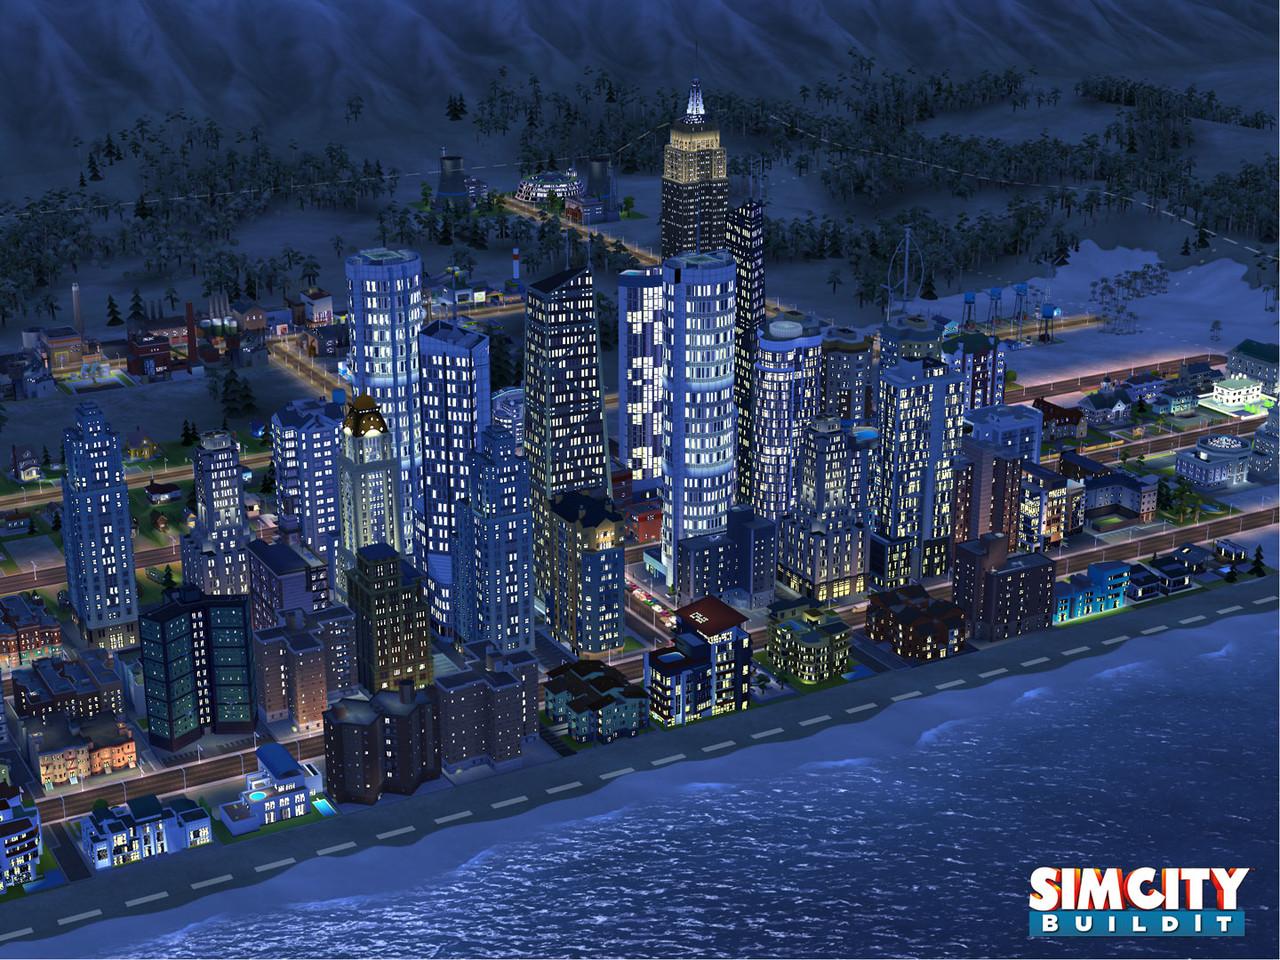 simcity-buildit-jeu-ea